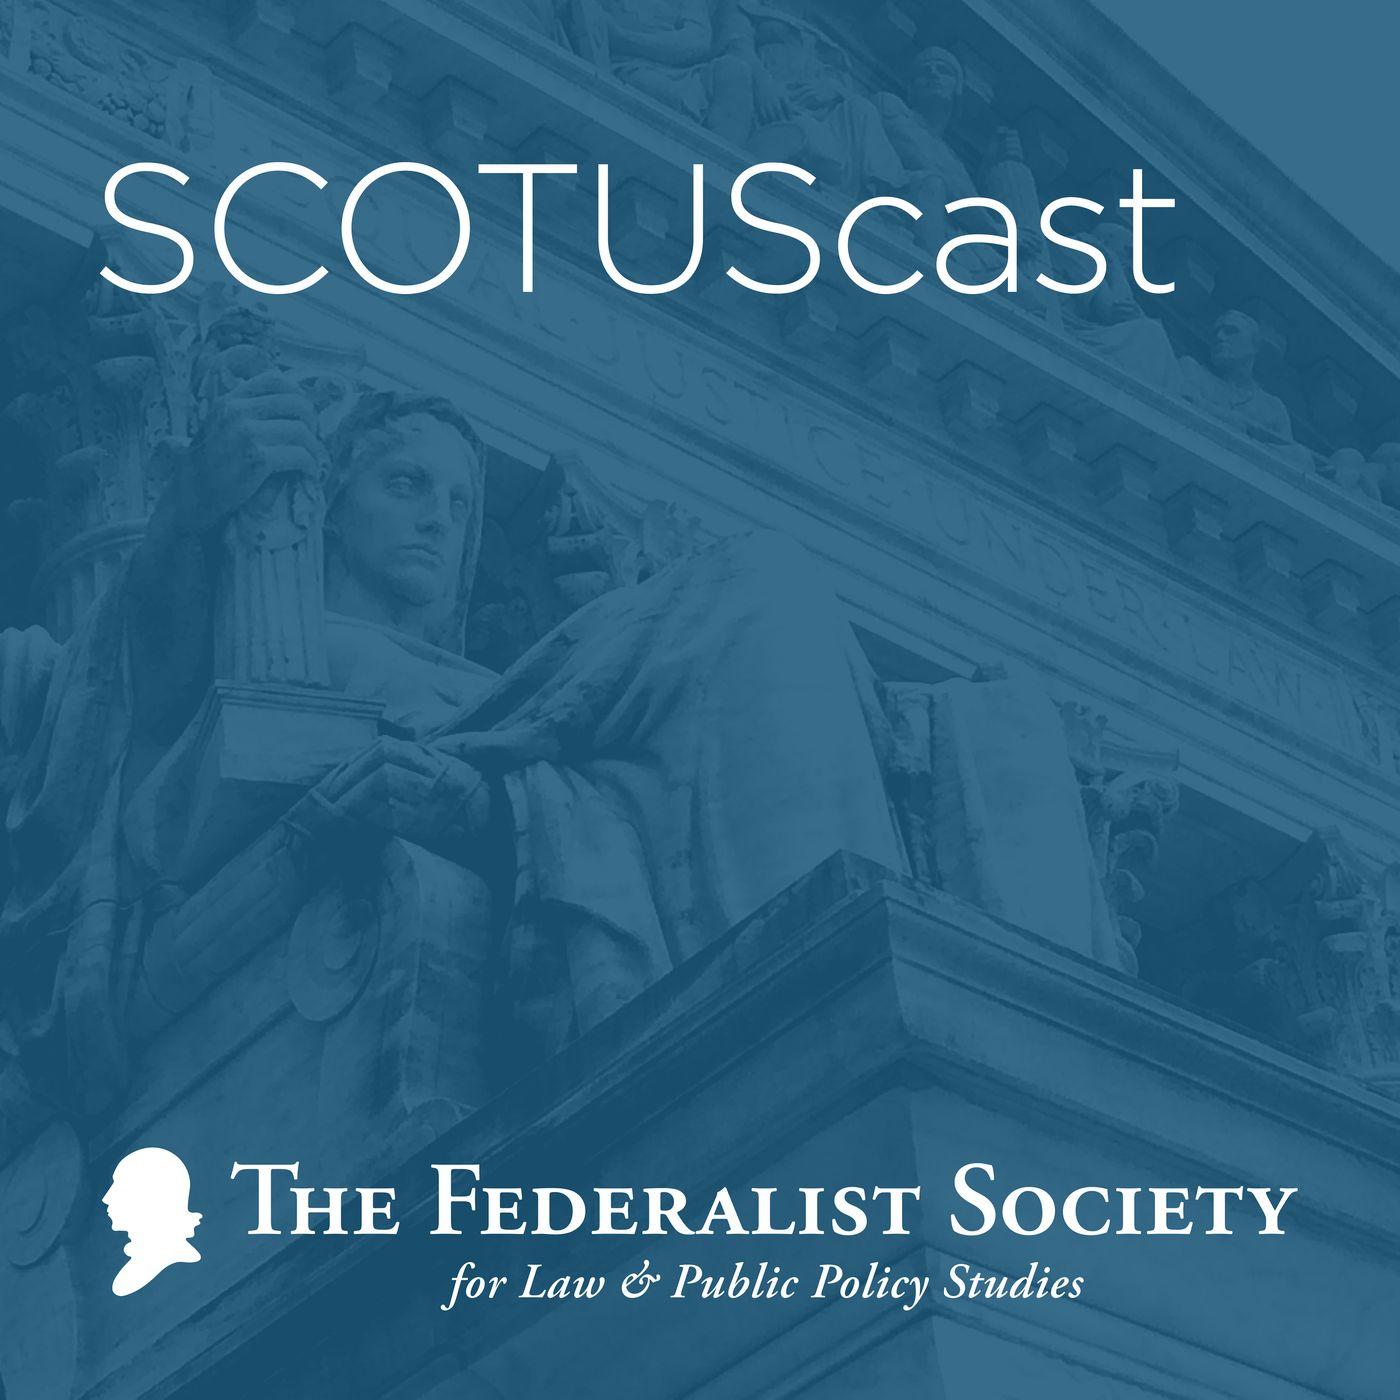 Van Buren v. United States - Post-Decision SCOTUScast